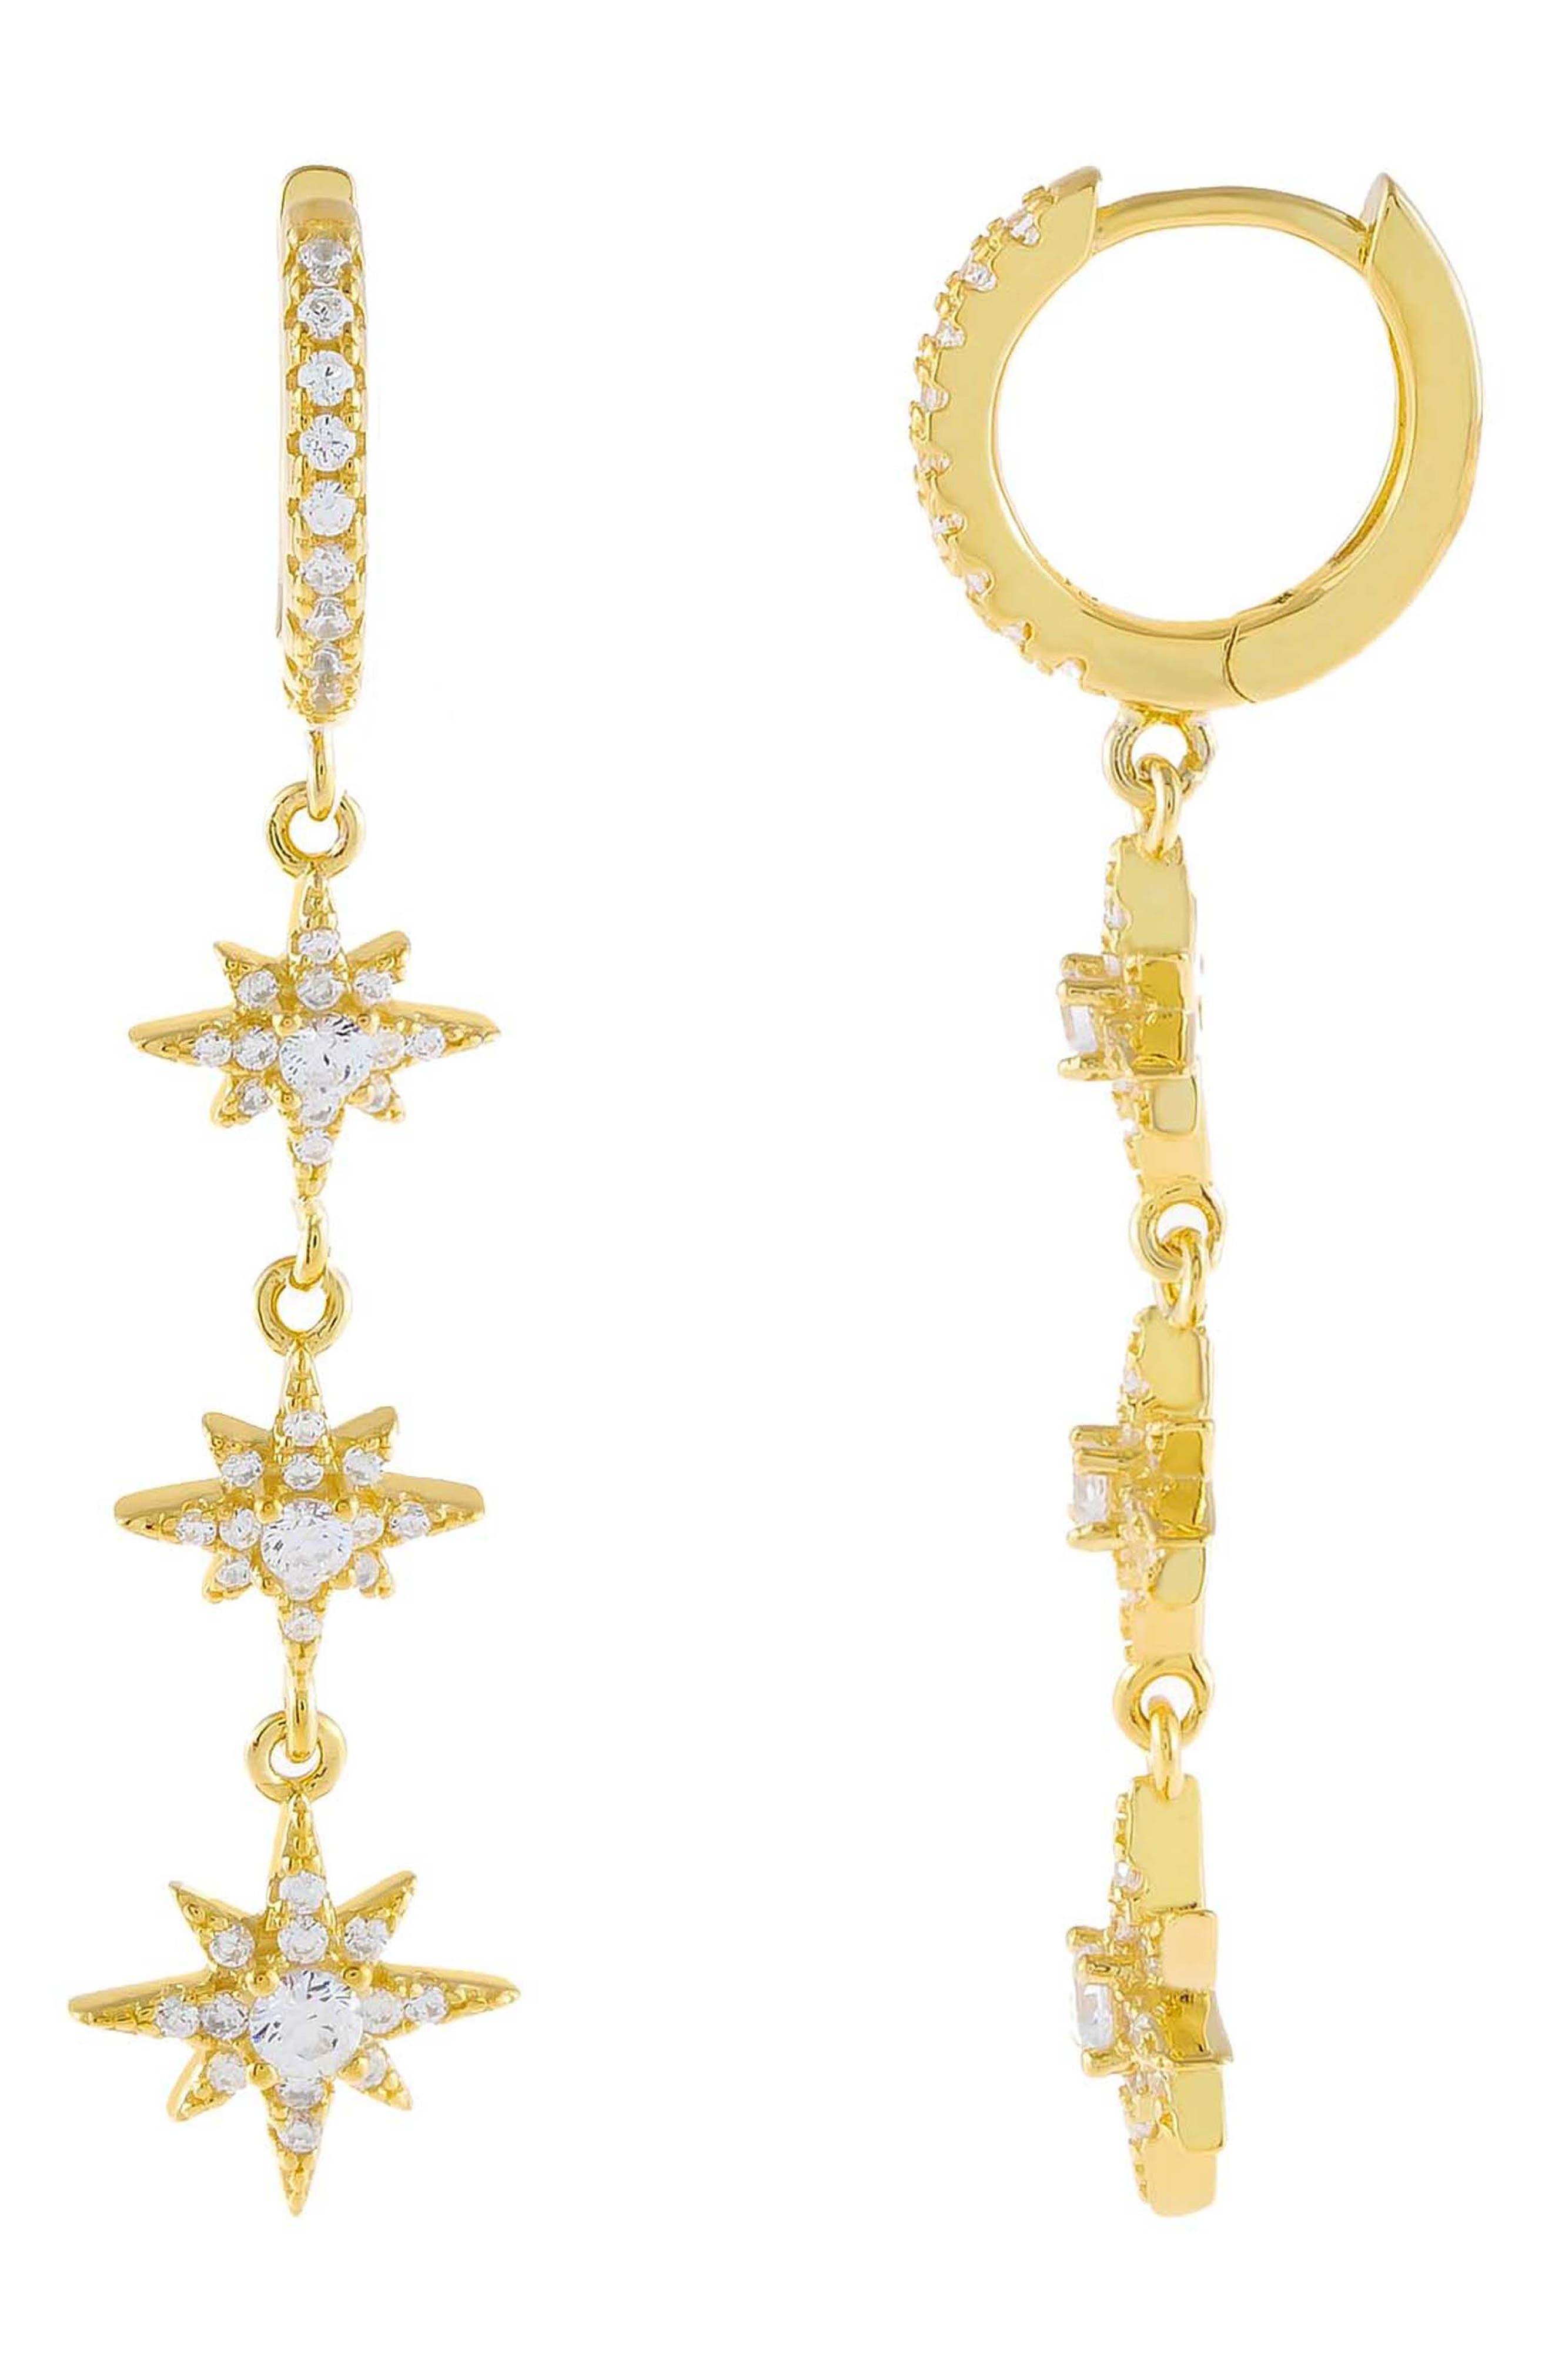 Women's Adina's Jewels Starburst Huggie Hoop Drop Earrings